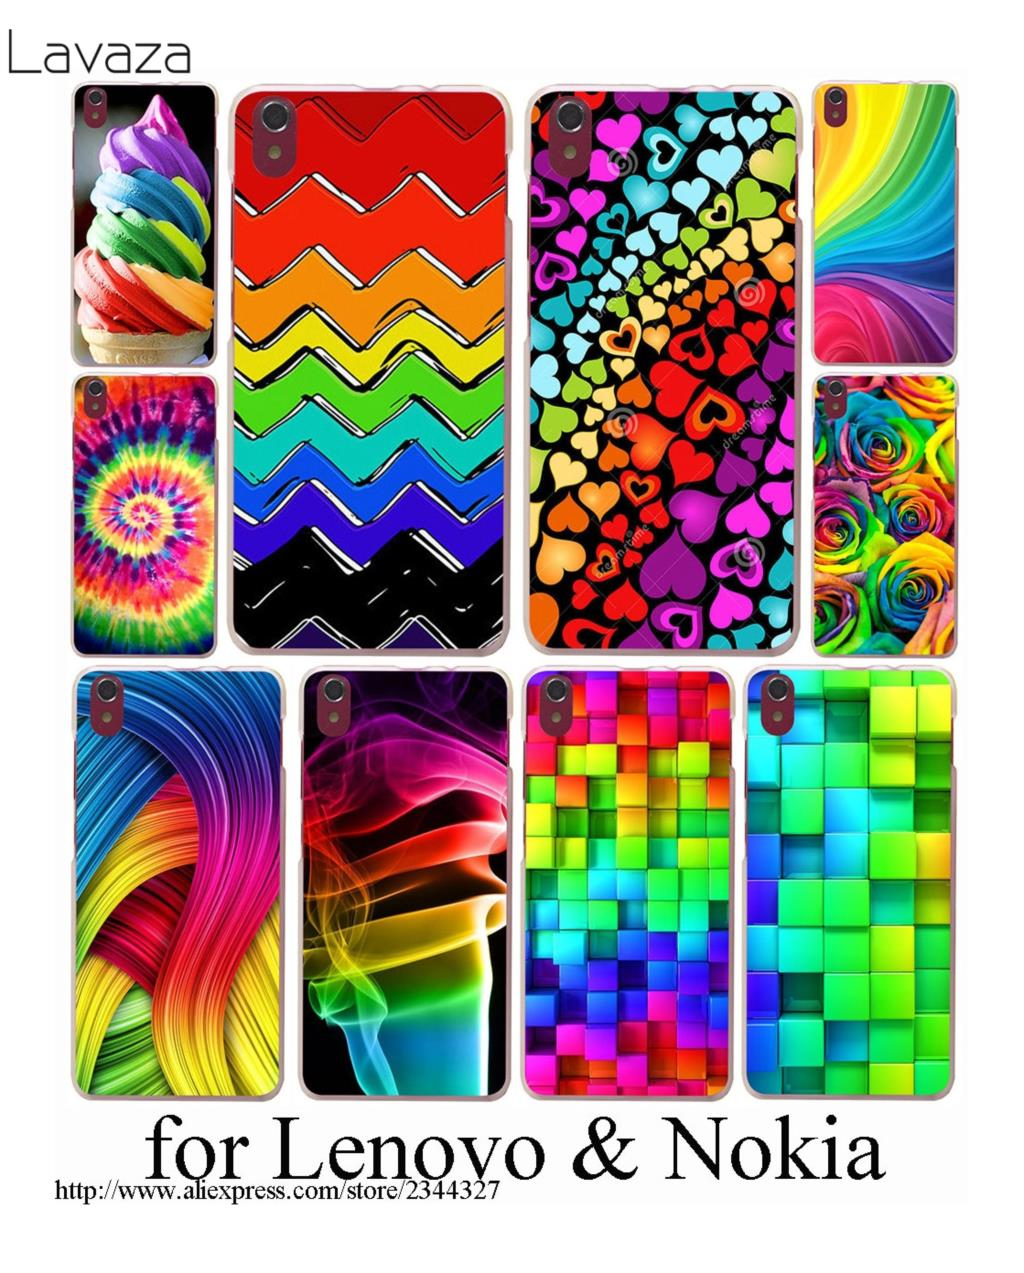 Lavaza Tie Dye Pattern Batic Rainbow Colourful Hard Case for Lenovo K6 note A328 A536 A1000 A2010 A5000 S850 S90 S60 ZUK Z2